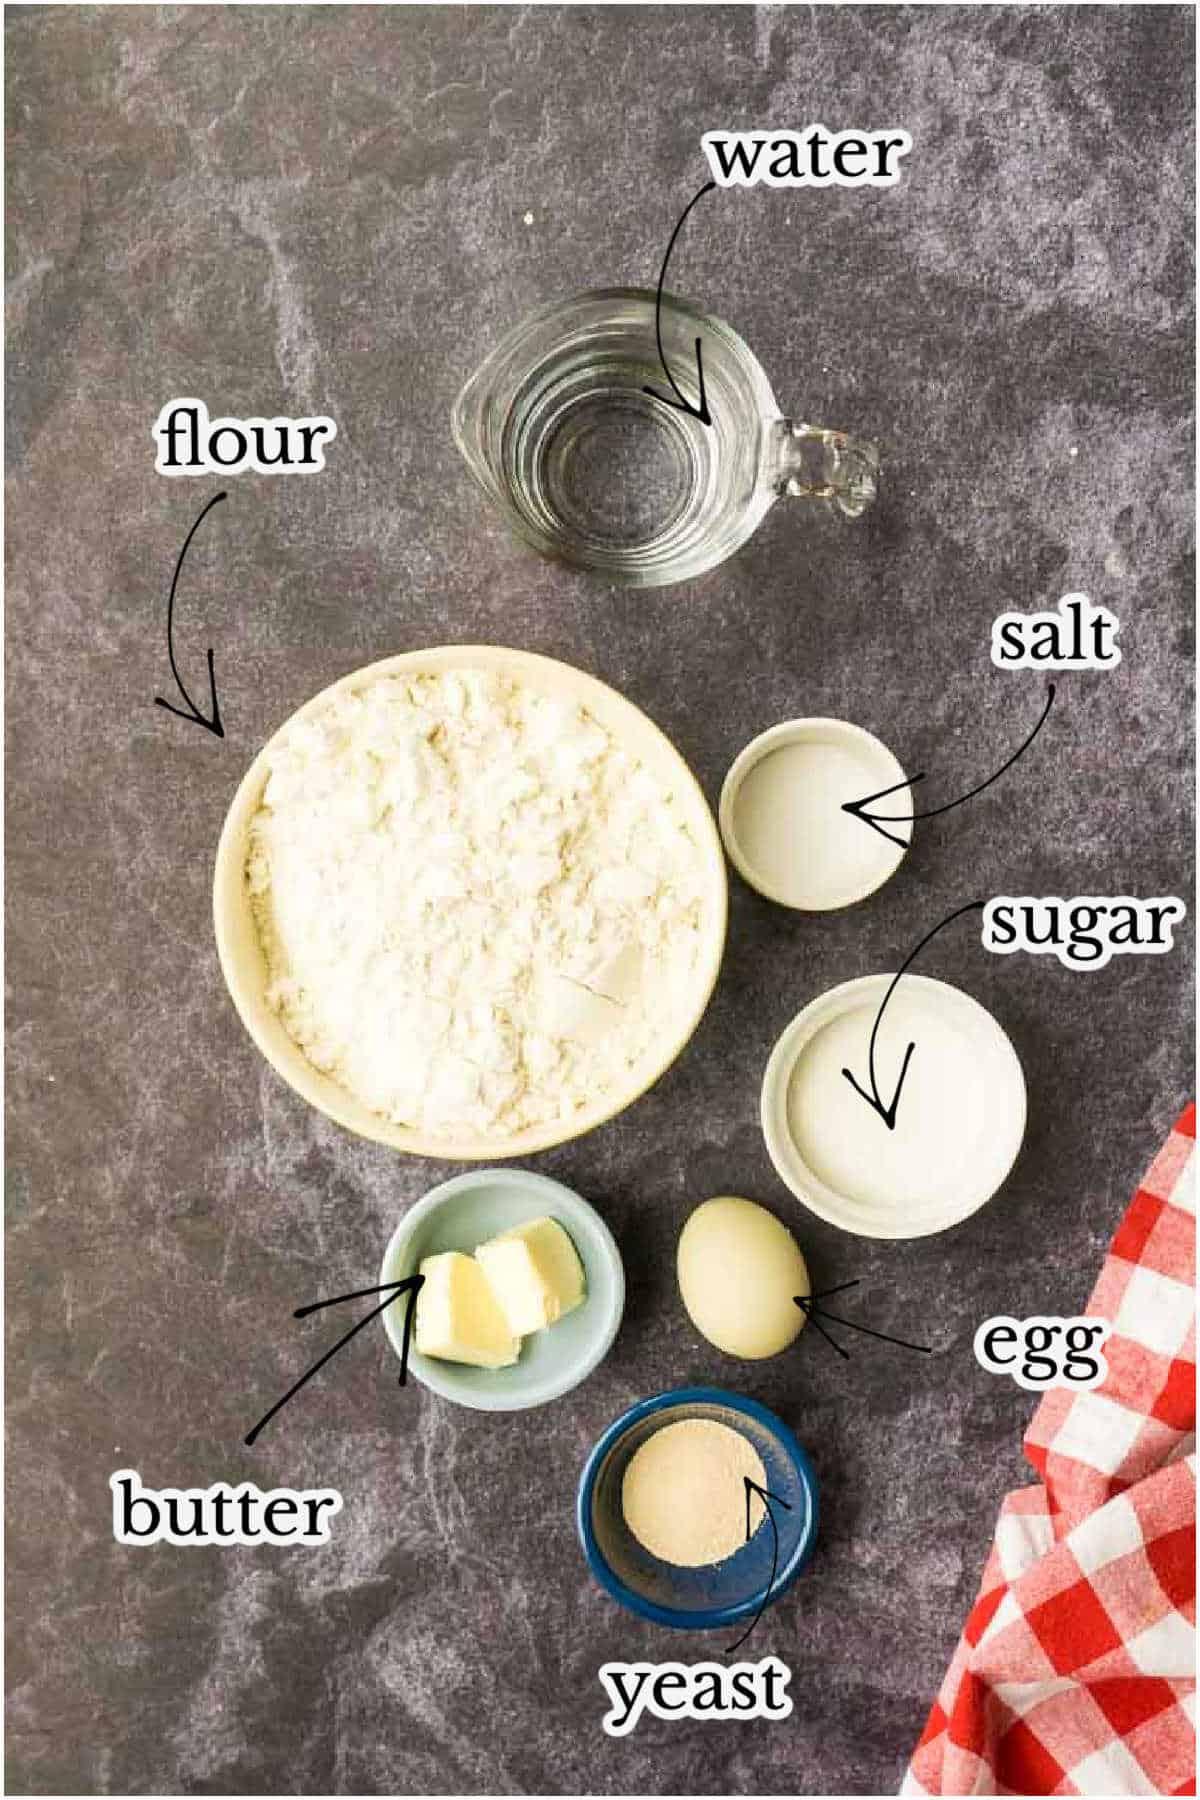 flour, butter, egg, sugar, salt, yeast in bowls on black counter